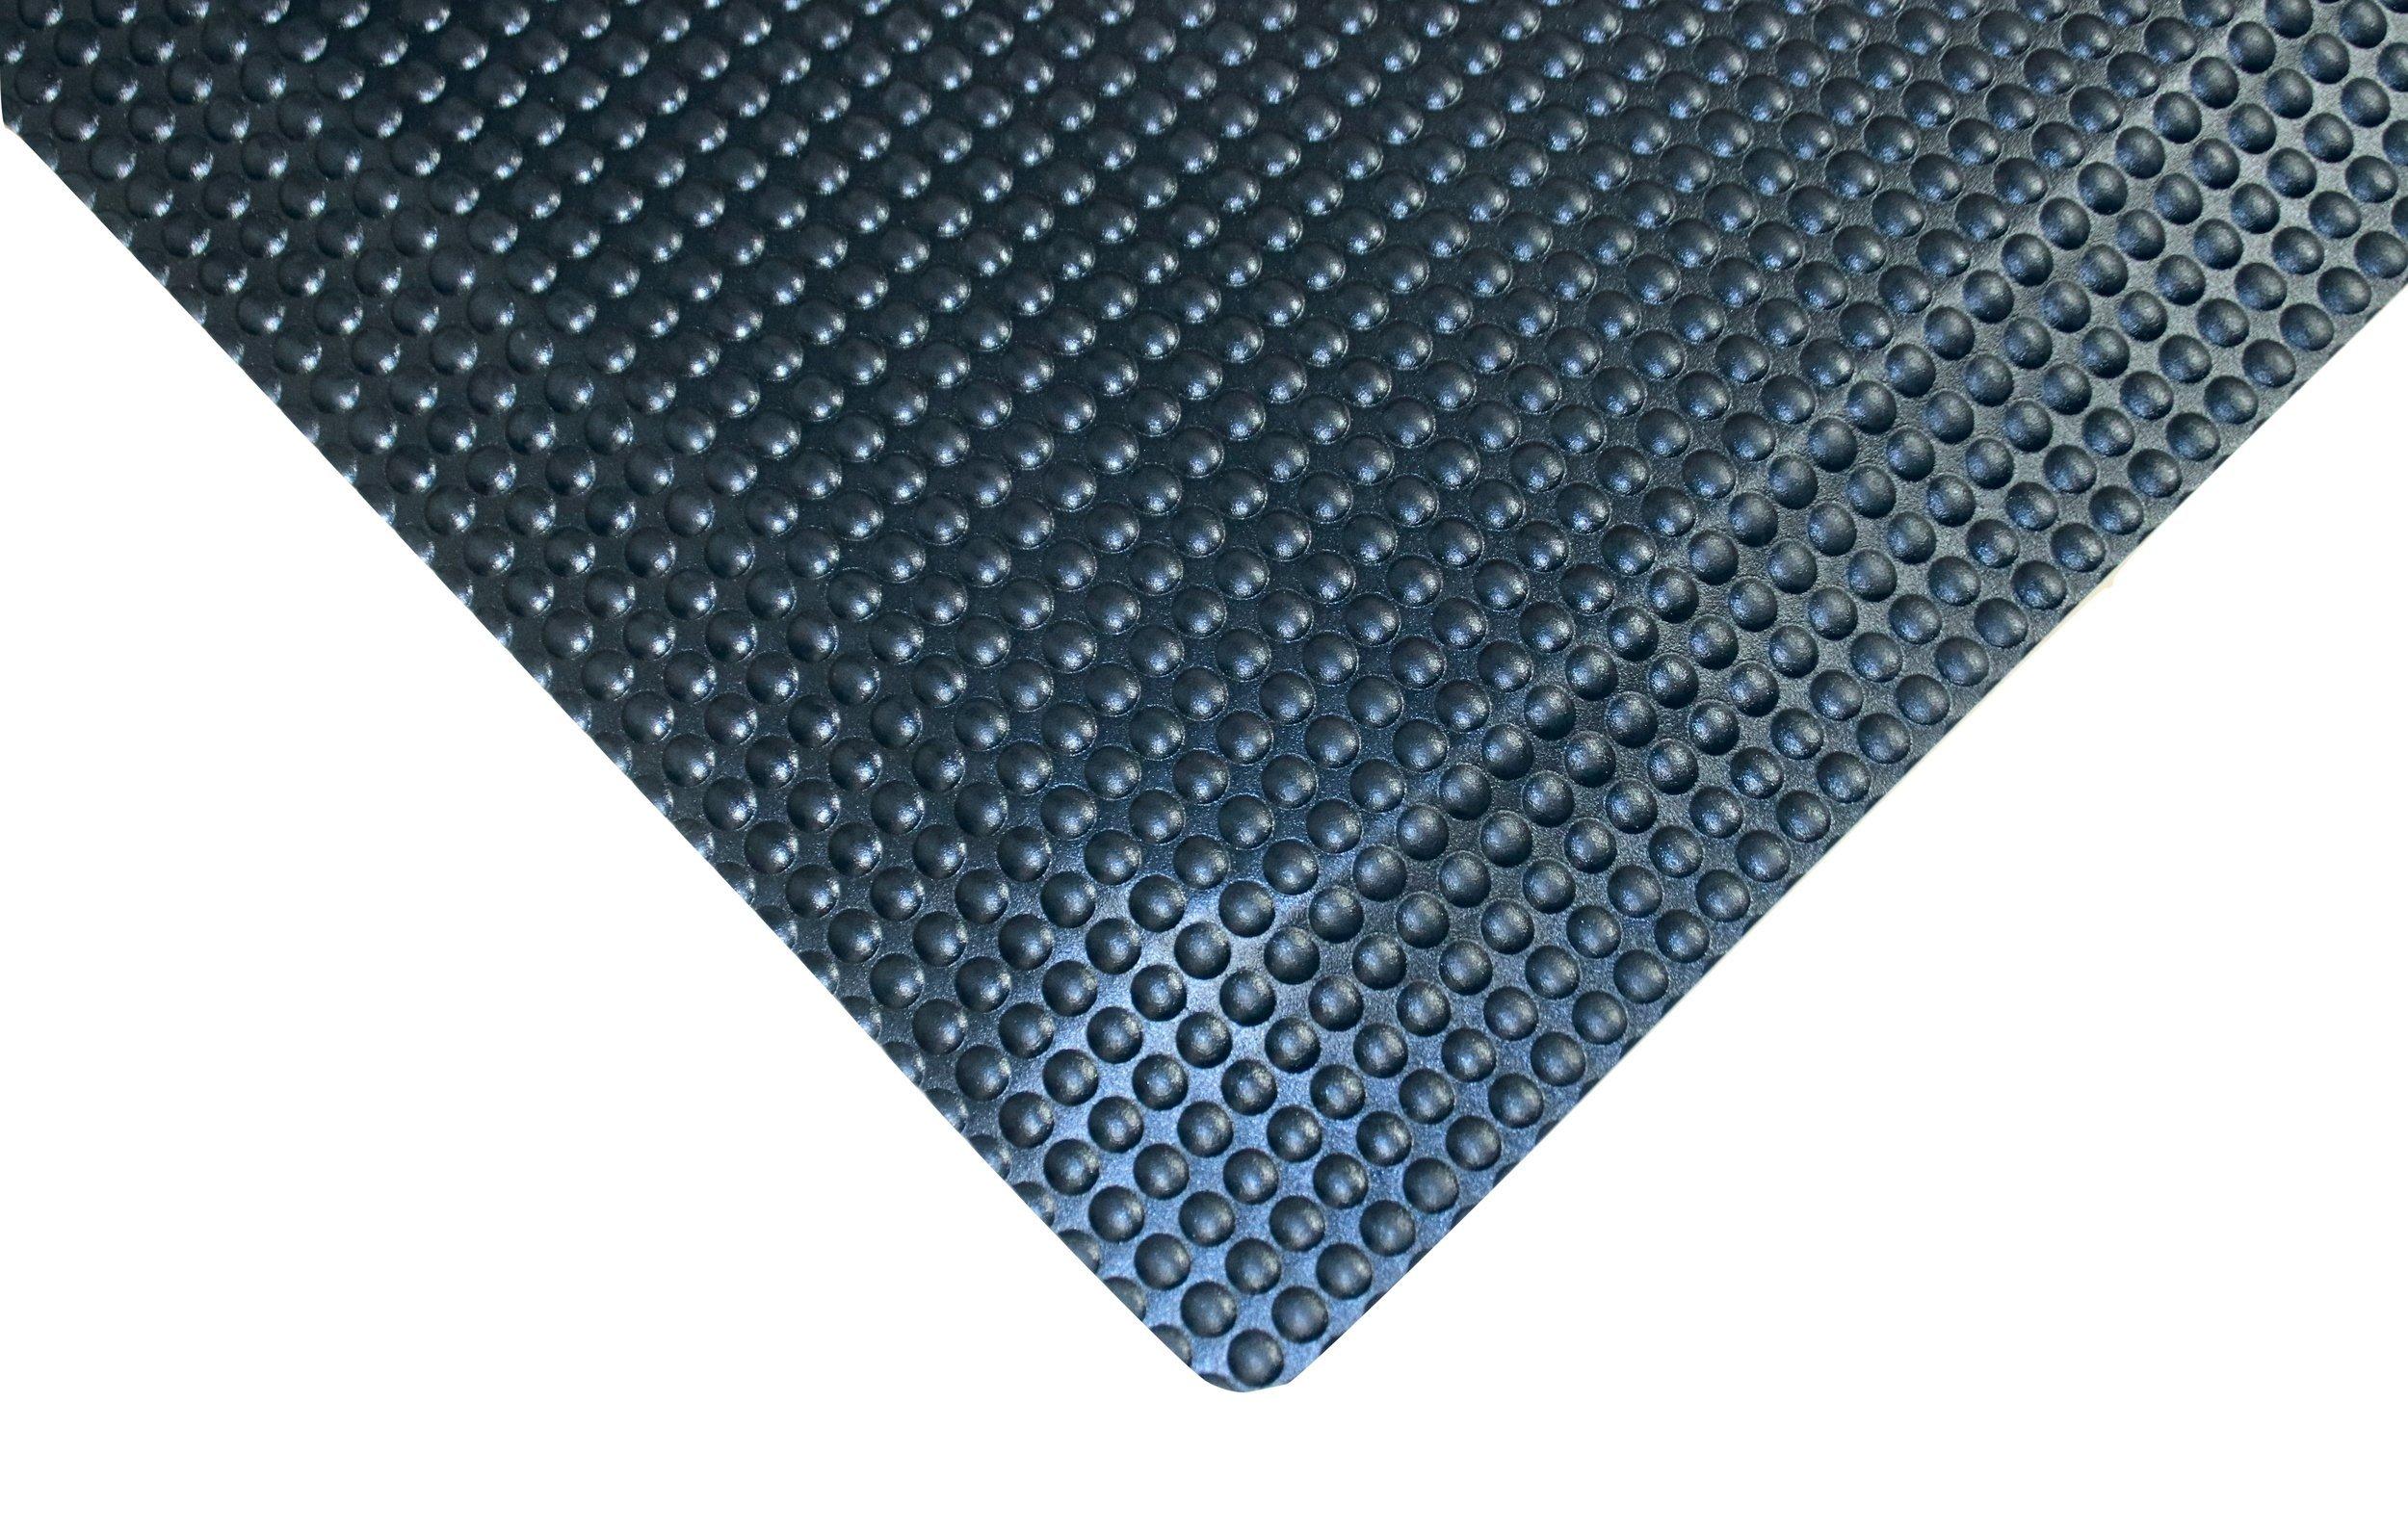 Rhino Mats RFLX36BX42 Reflex Anti-Fatigue Mat, Vinyl, 3' x 42' x 5/8'', Black by Rhino Mats